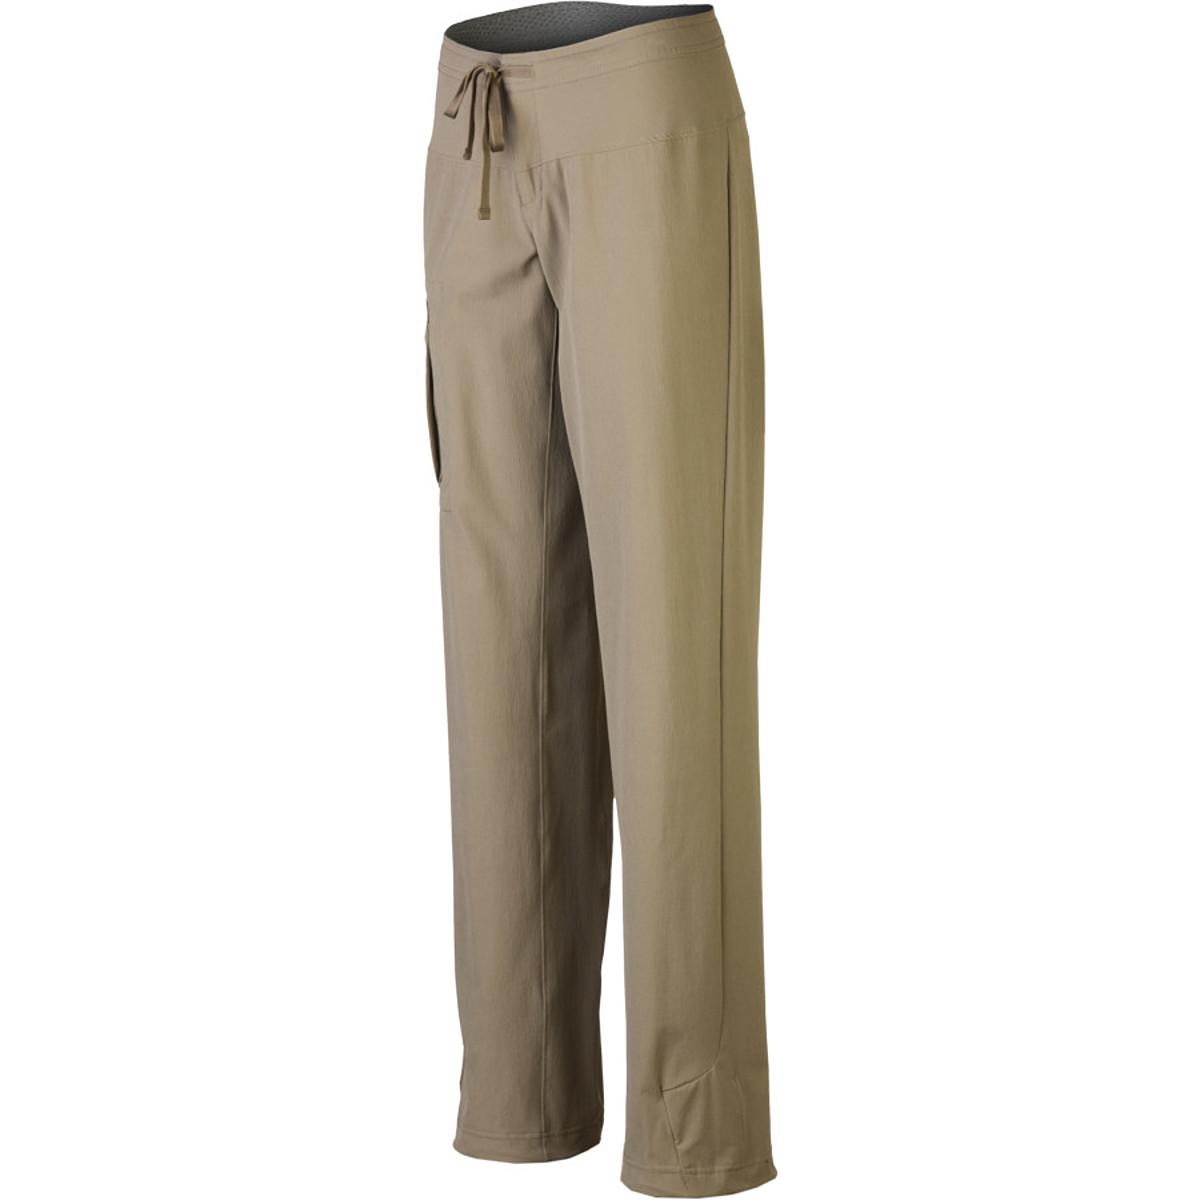 Mountain Hardwear Yuma Pant